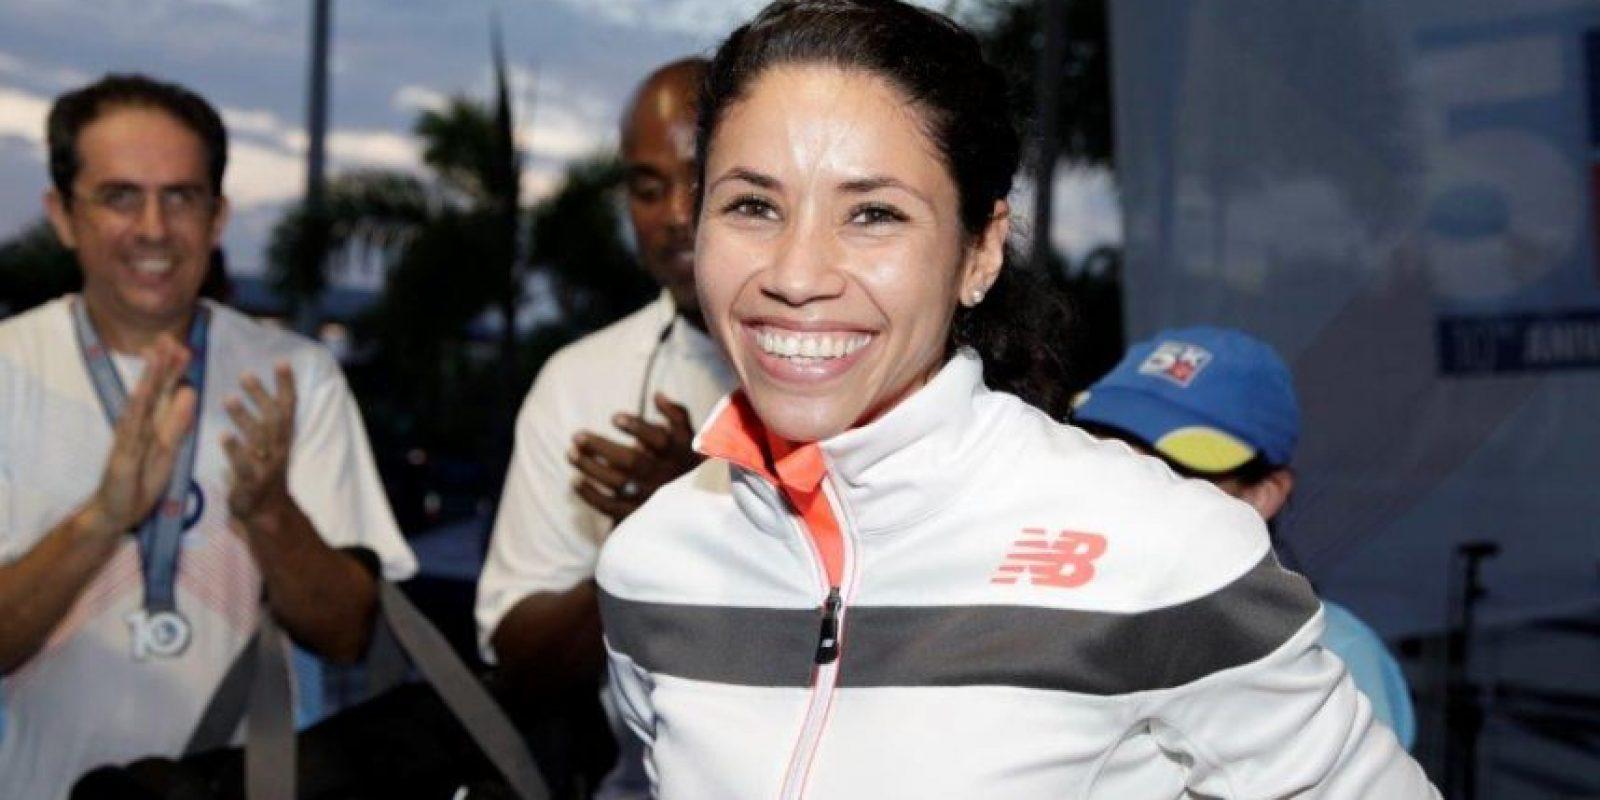 atletas Beverly Ramos Foto:Suministrada. Imagen Por: